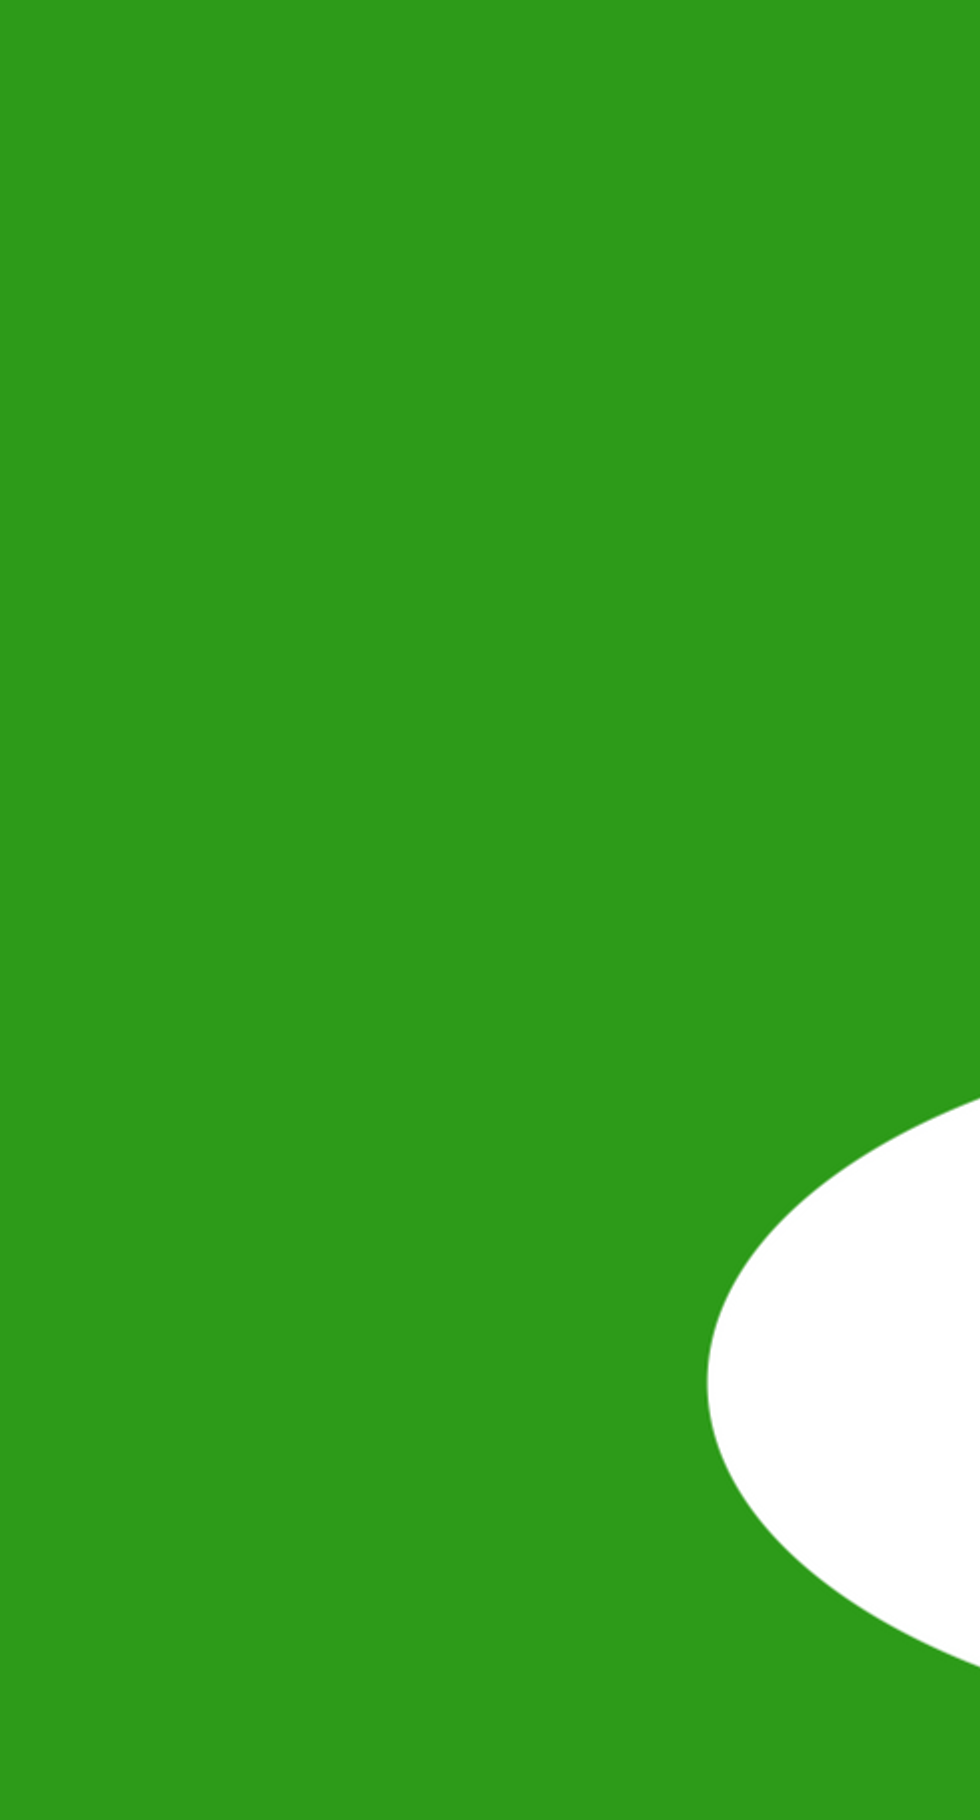 Logo TSG colore originale 4k.png